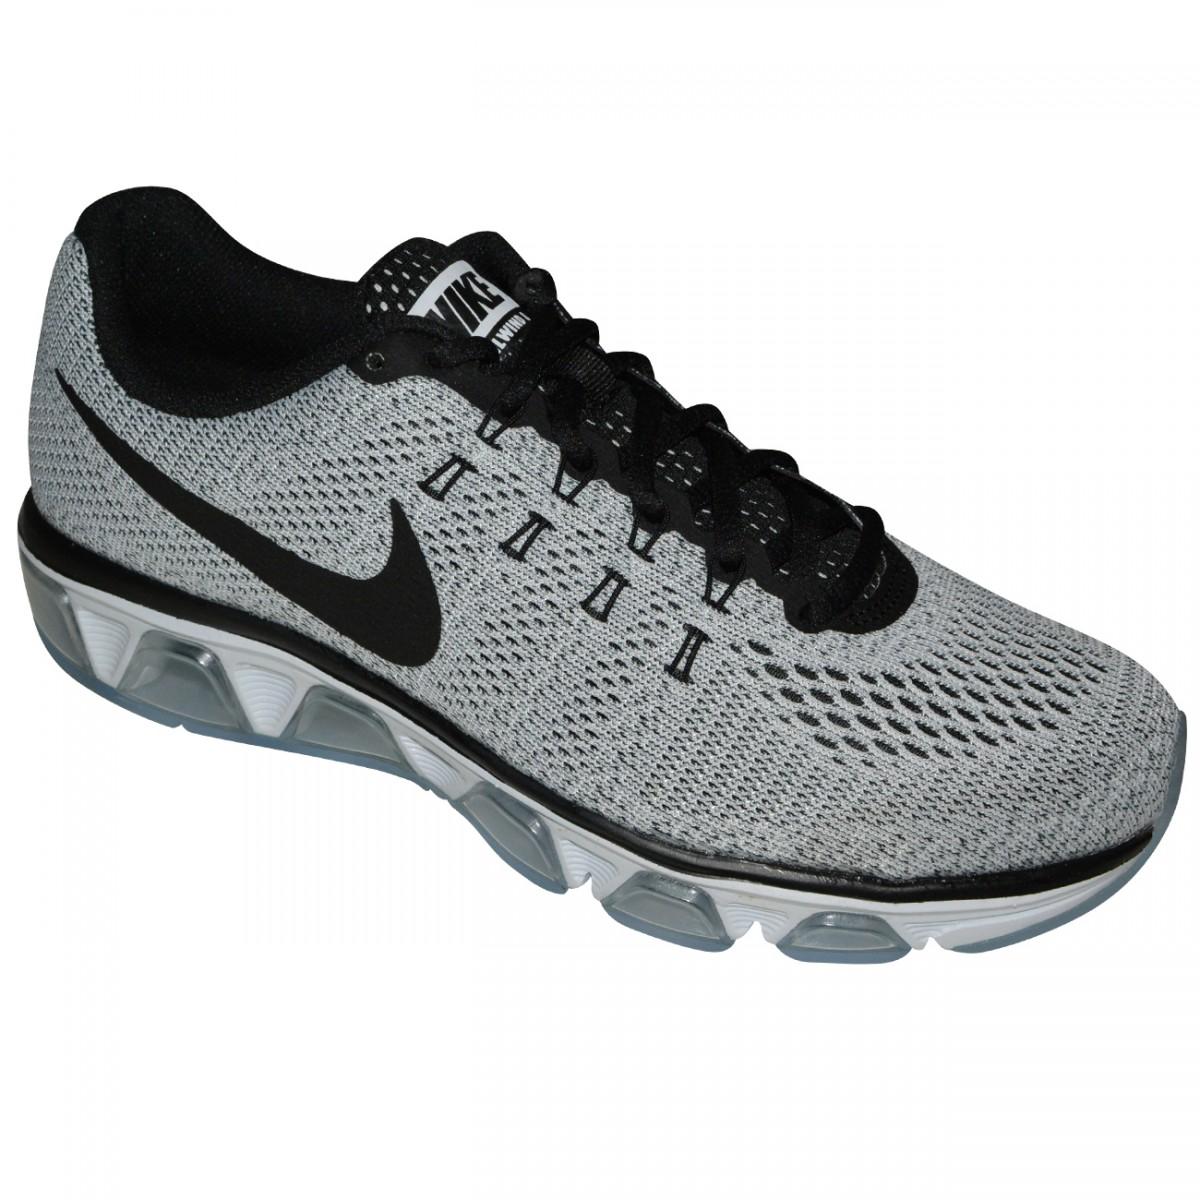 42da860e4 Tenis Nike Air Max Tailwind 8 805941 101 - Mescla Preto - Chuteira Nike